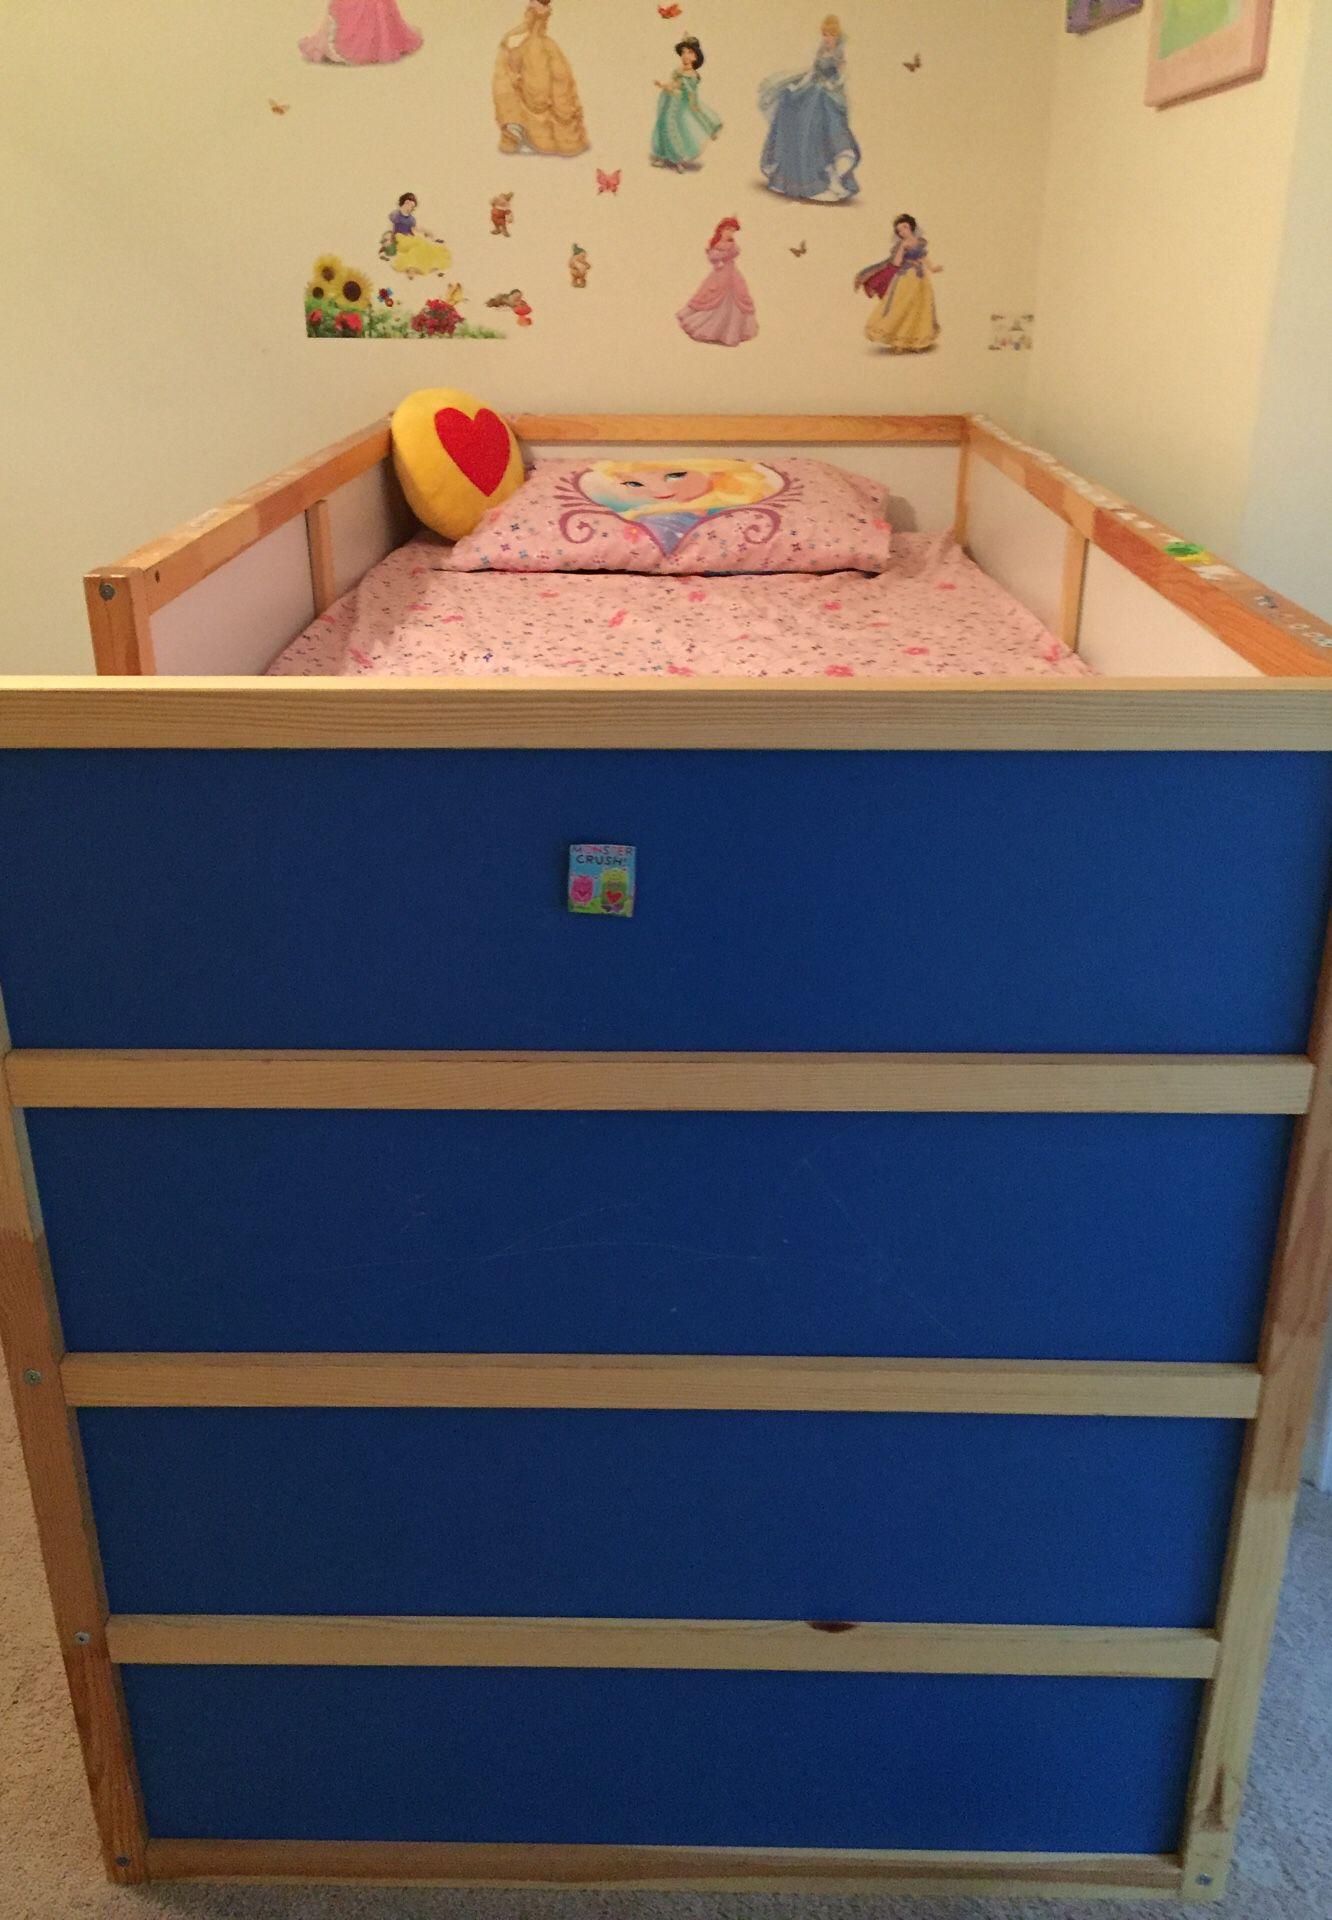 Ikea Kura Reversible Bed 60 Mattress 30 For Sale In Roswell Ga Offerup